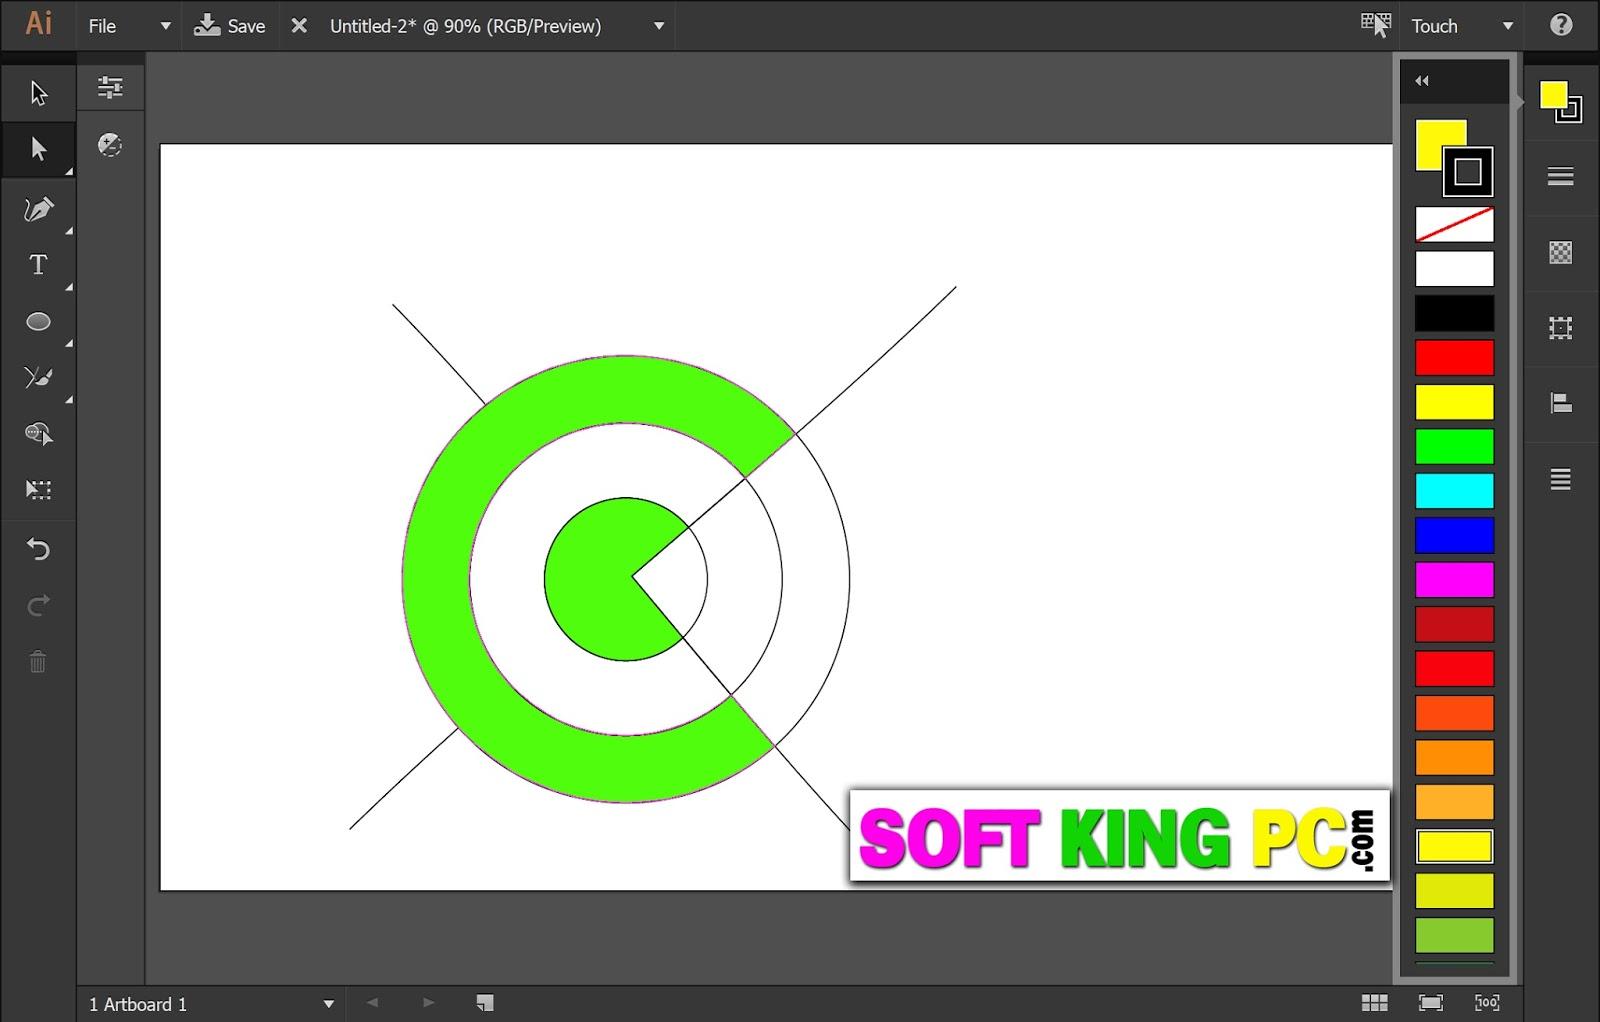 Adobe Illustrator CC 2018 Latest Version Download - SOFT KING PC - Download New Software 2019